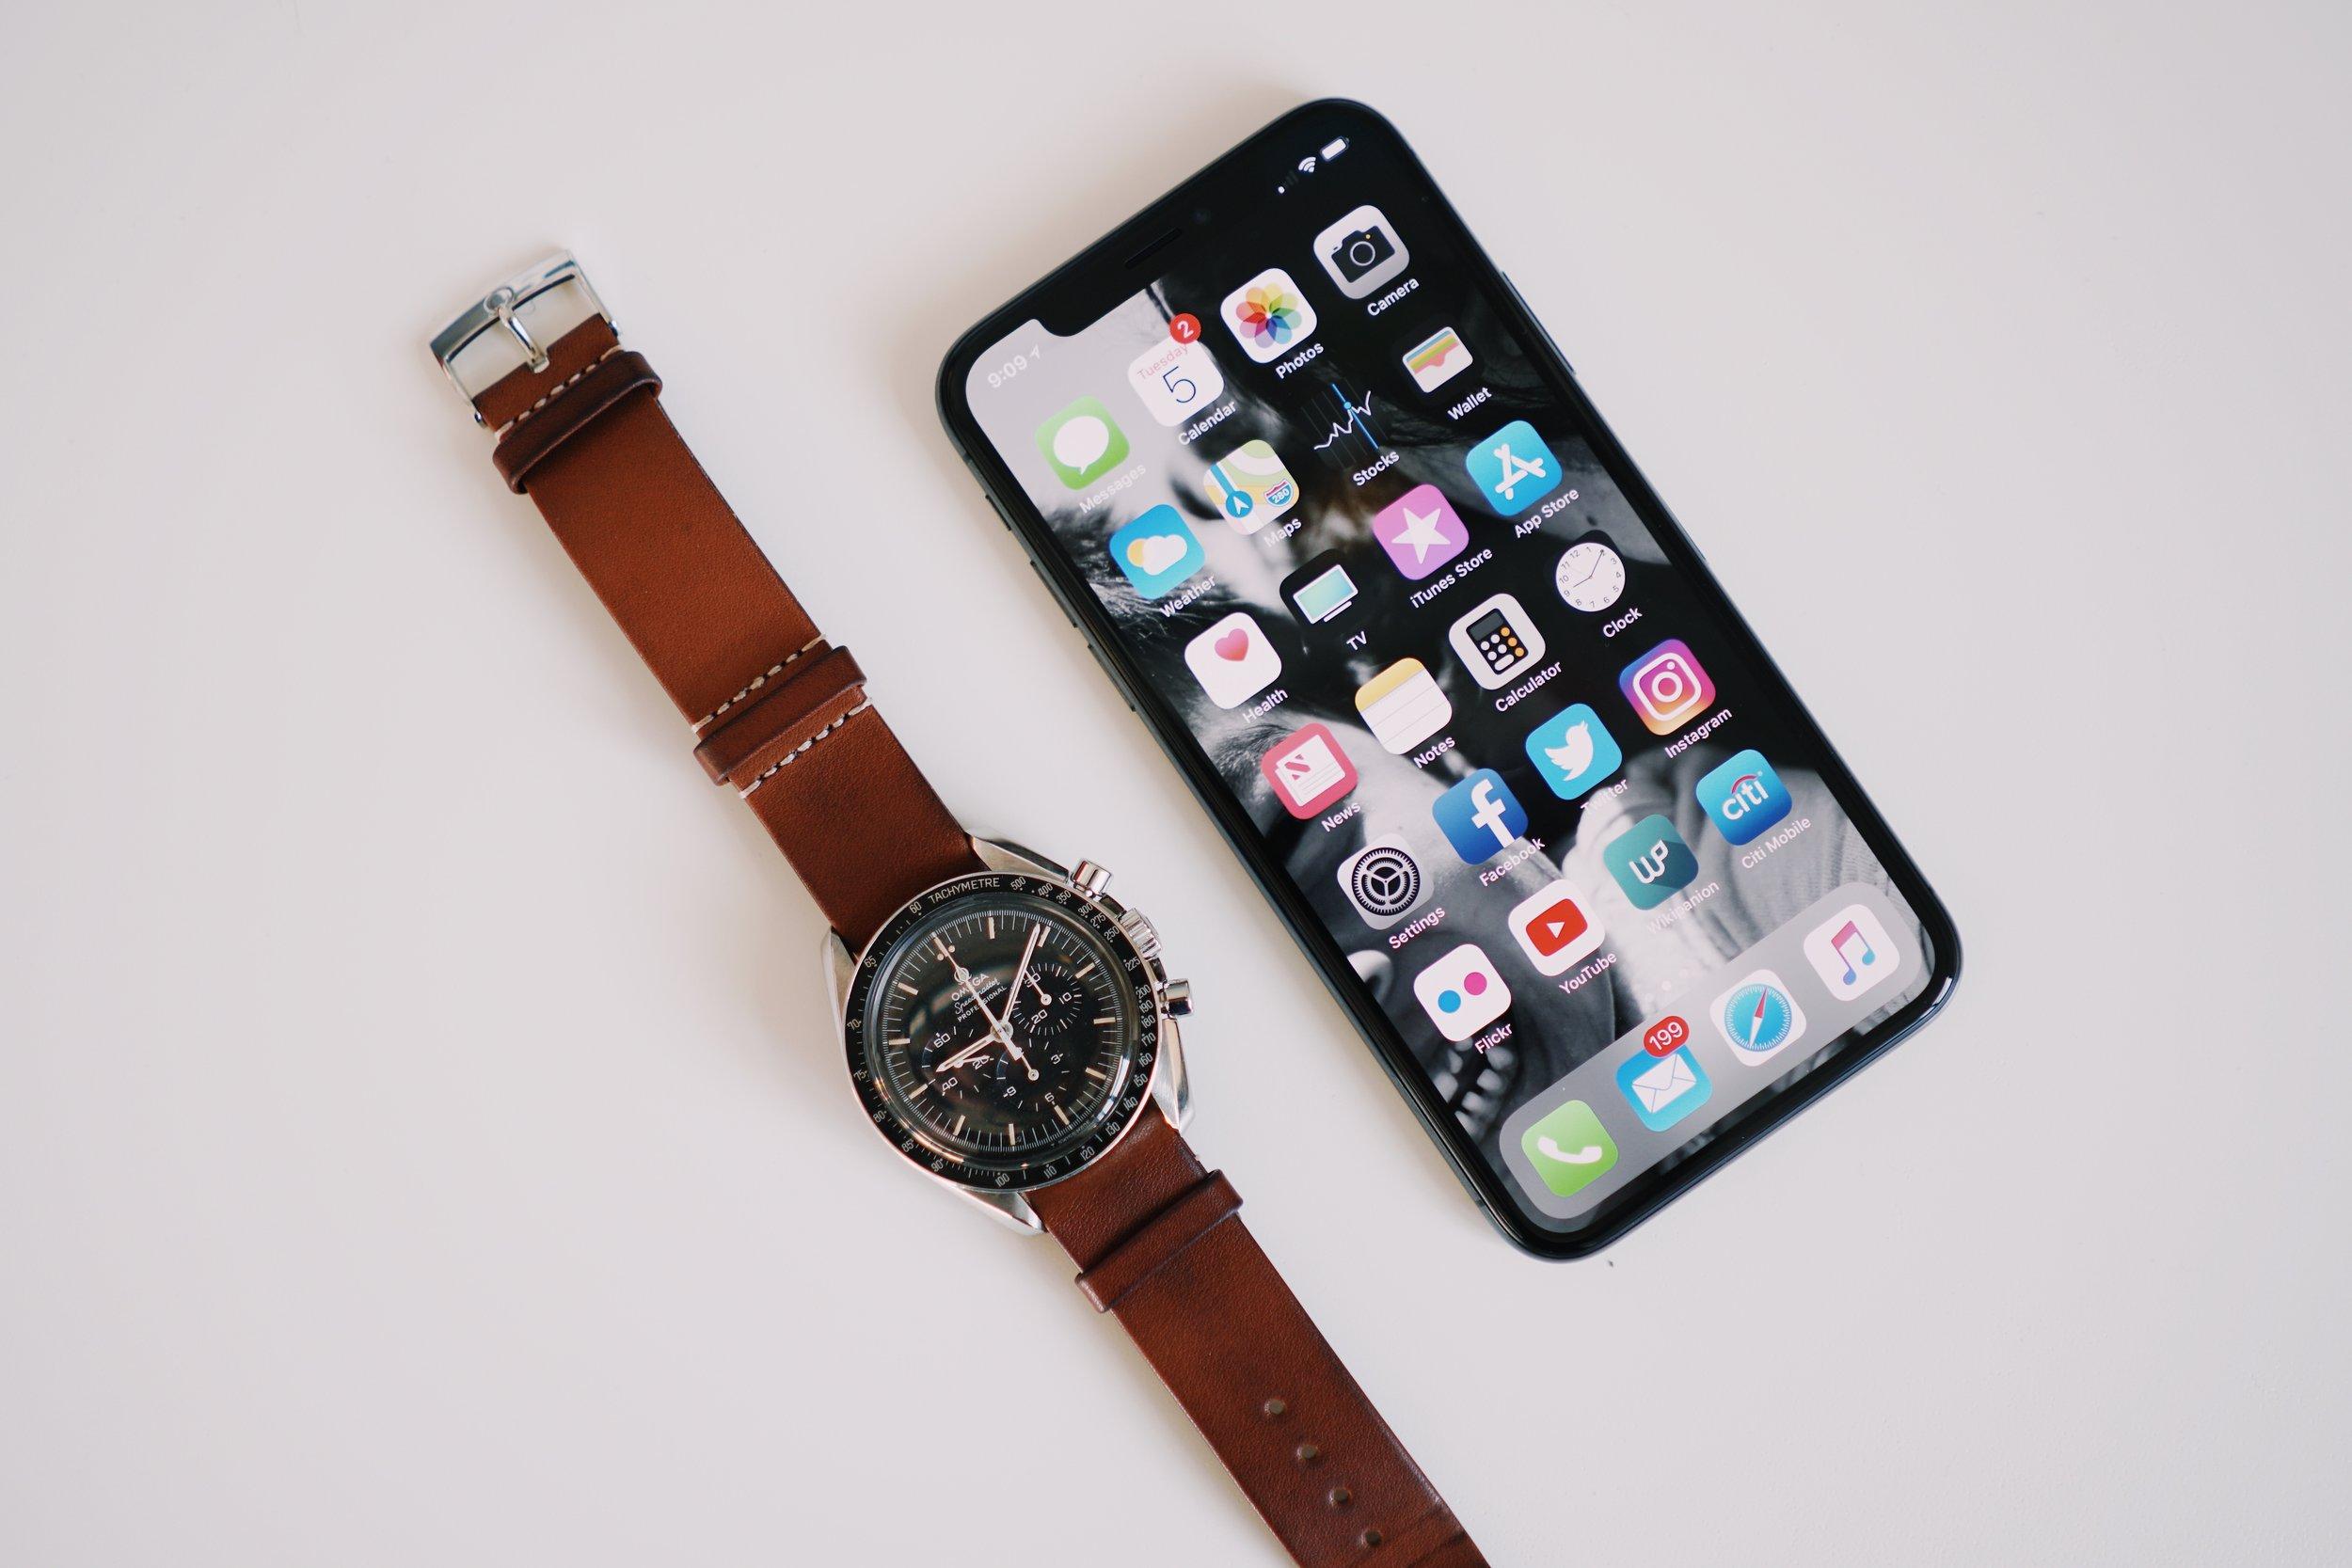 Omega Speedmaster ref 145.022 x Apple iPhone X